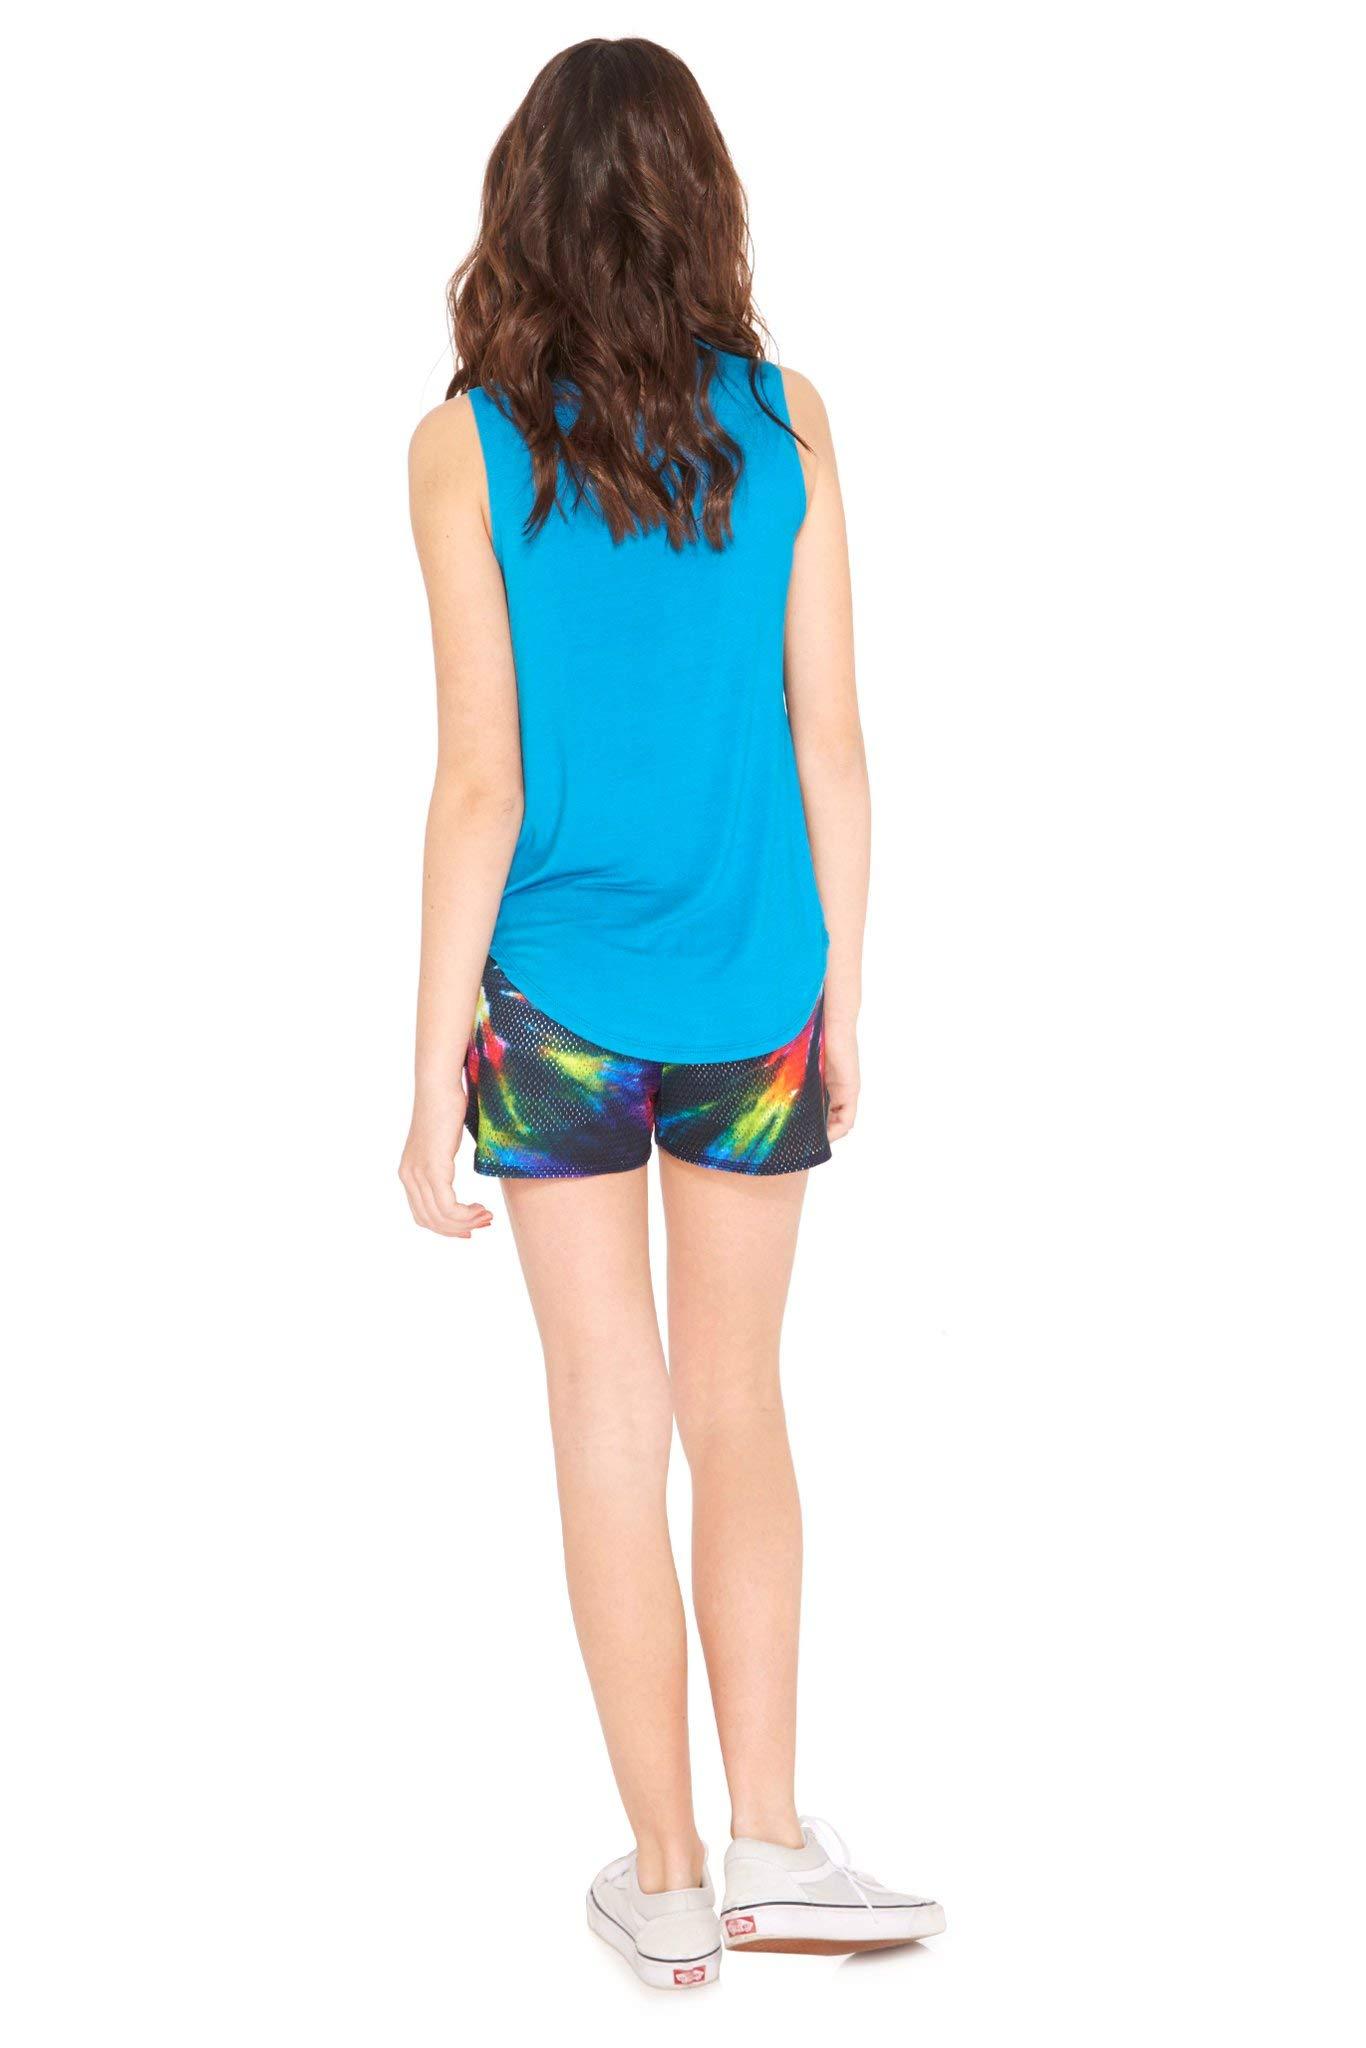 Terez Girls Classic Mesh Shorts (Tie Dye, 4 - Small) by Terez (Image #3)